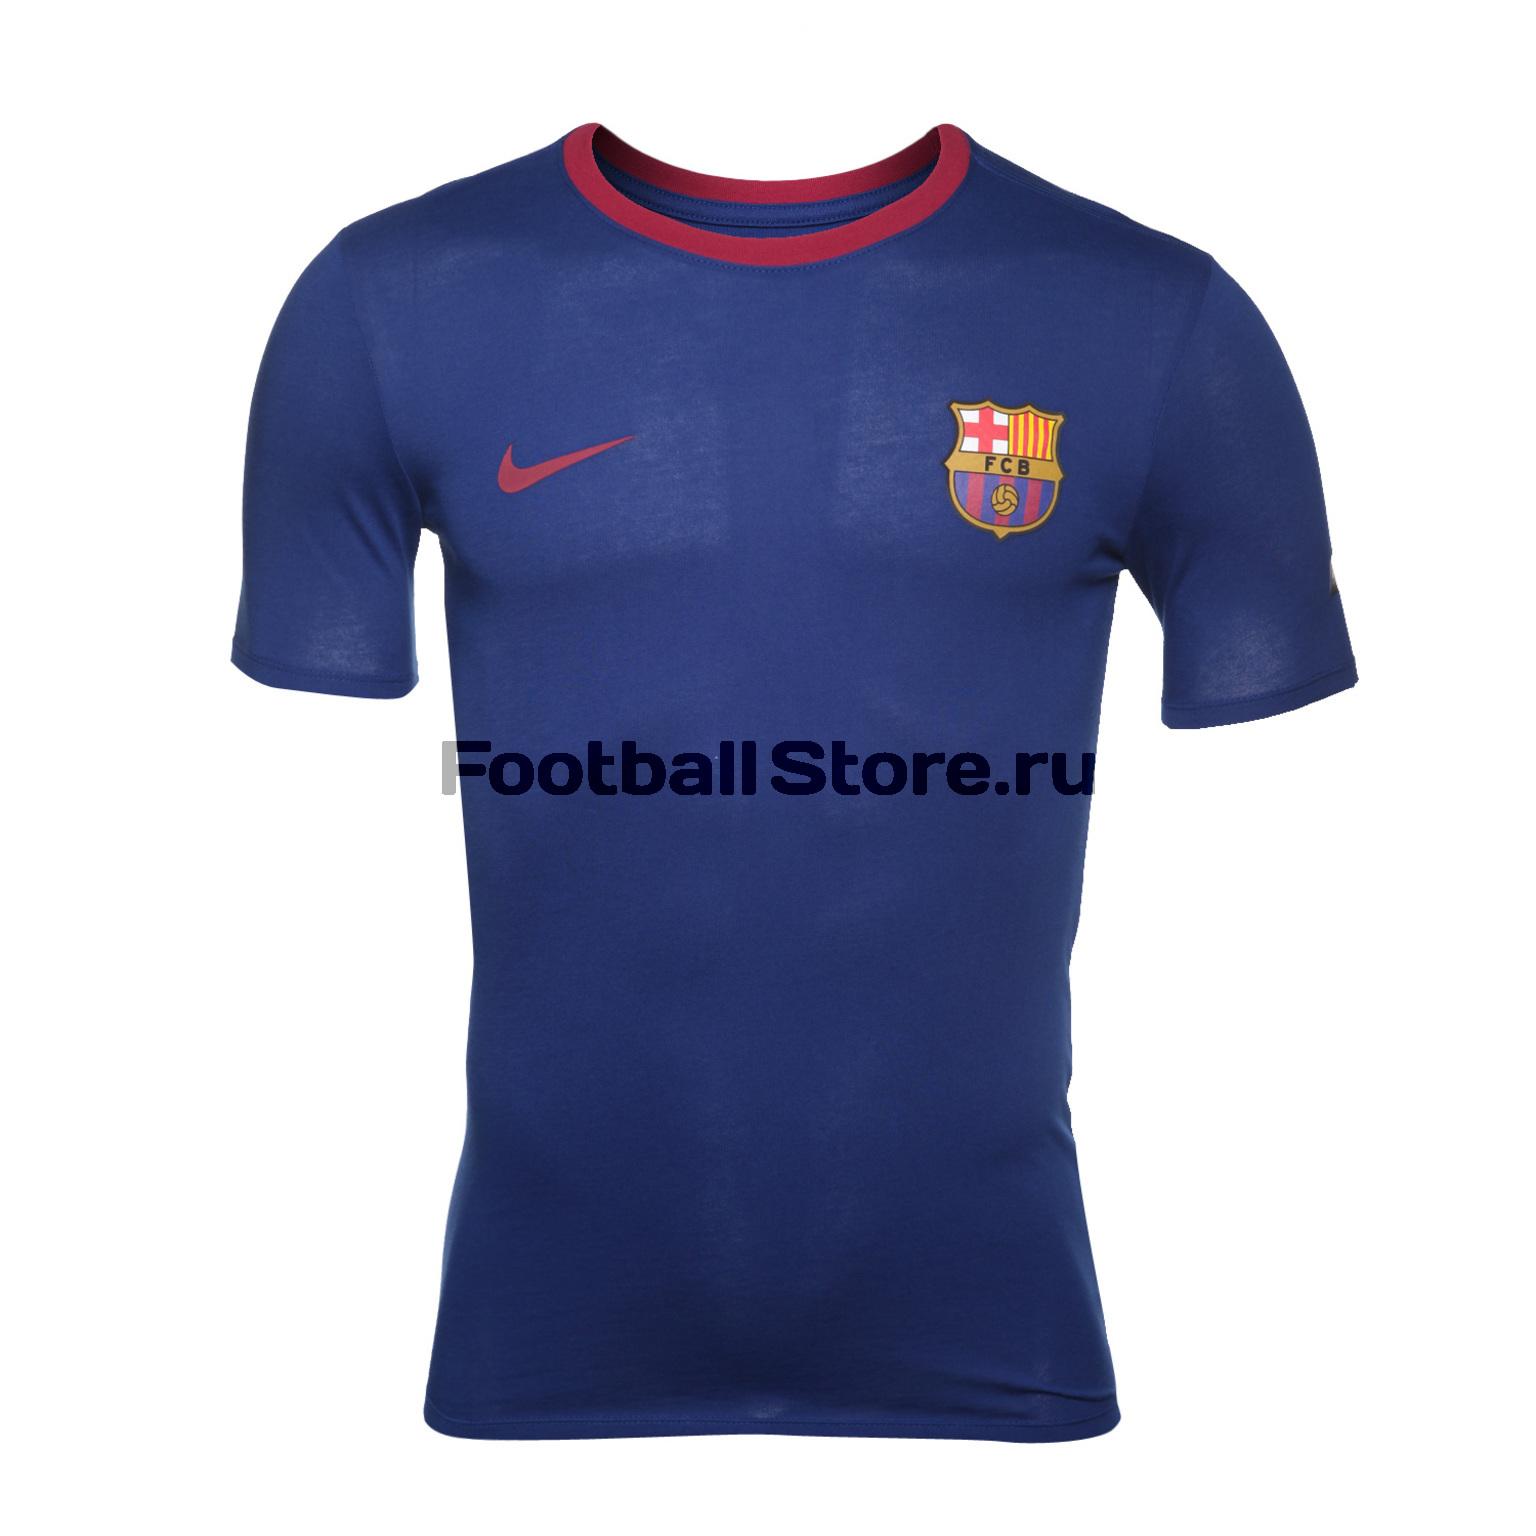 Футболка Nike Barcelona Tee Crest 888801-455